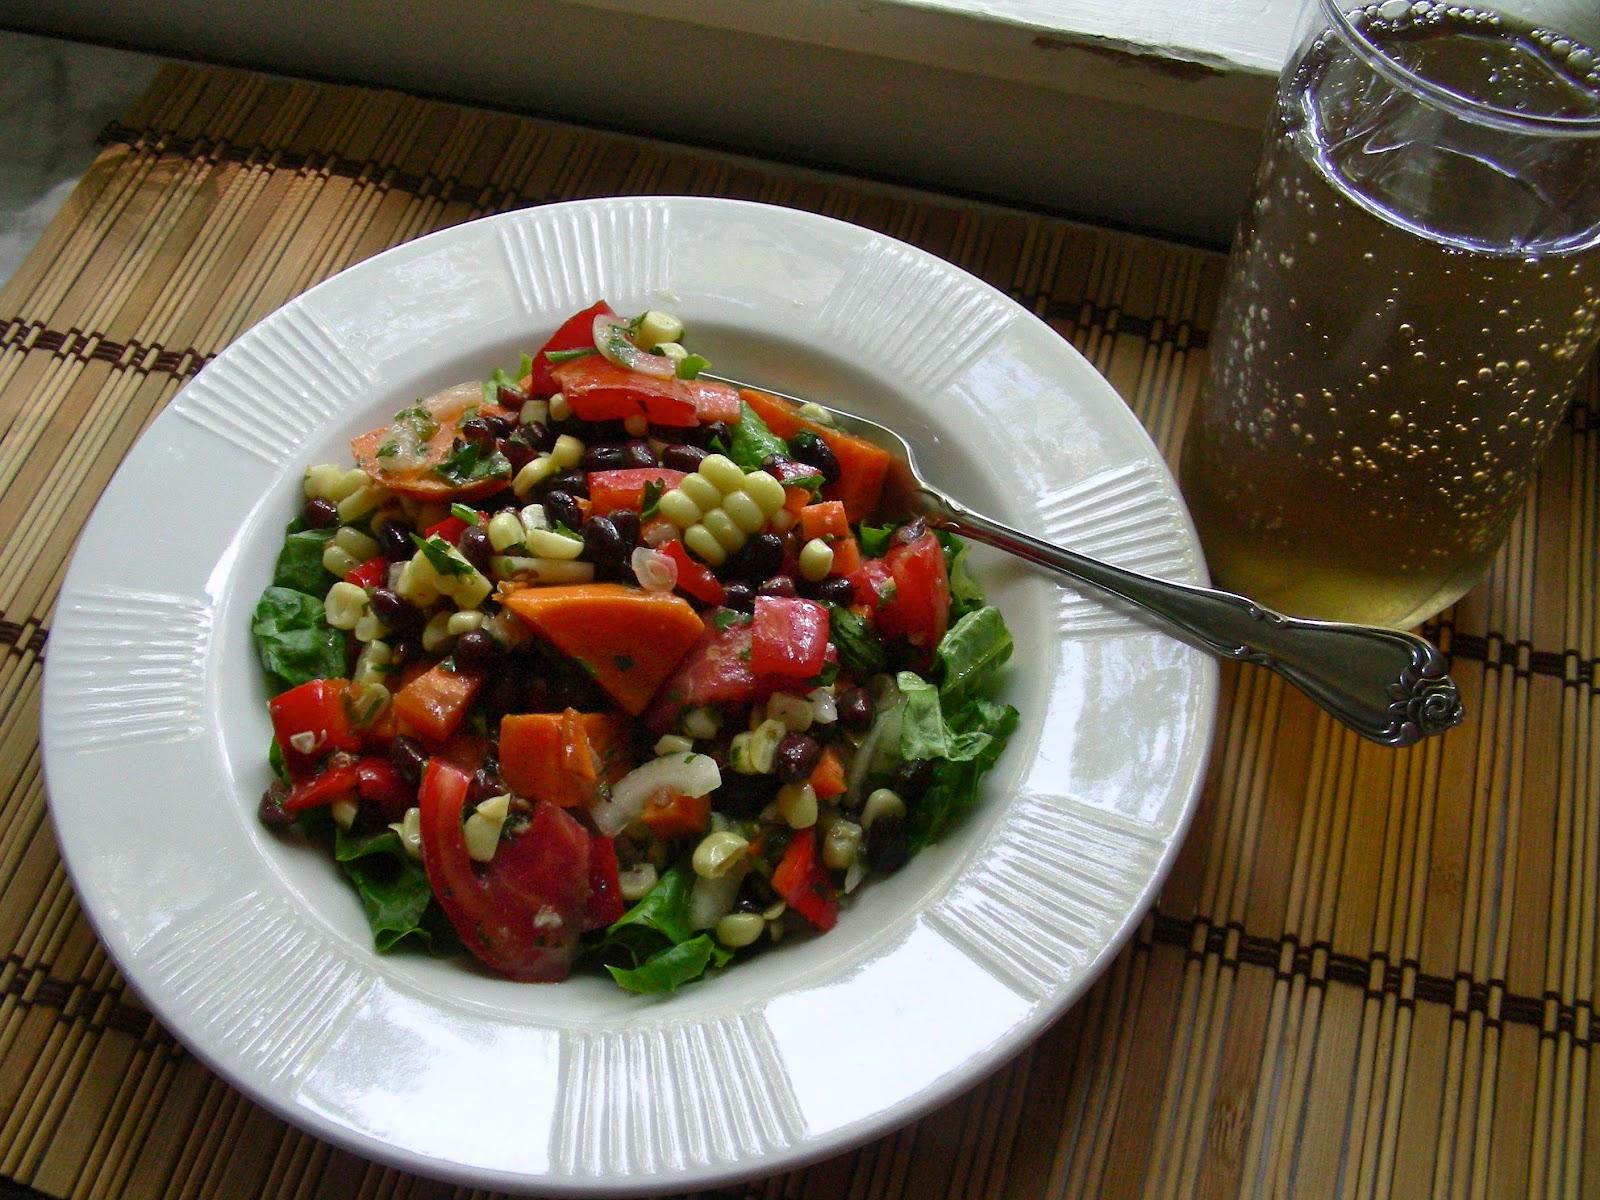 ... Can Cook: Random Food Fridays - Sweet Potato and Adzuki Bean Salad